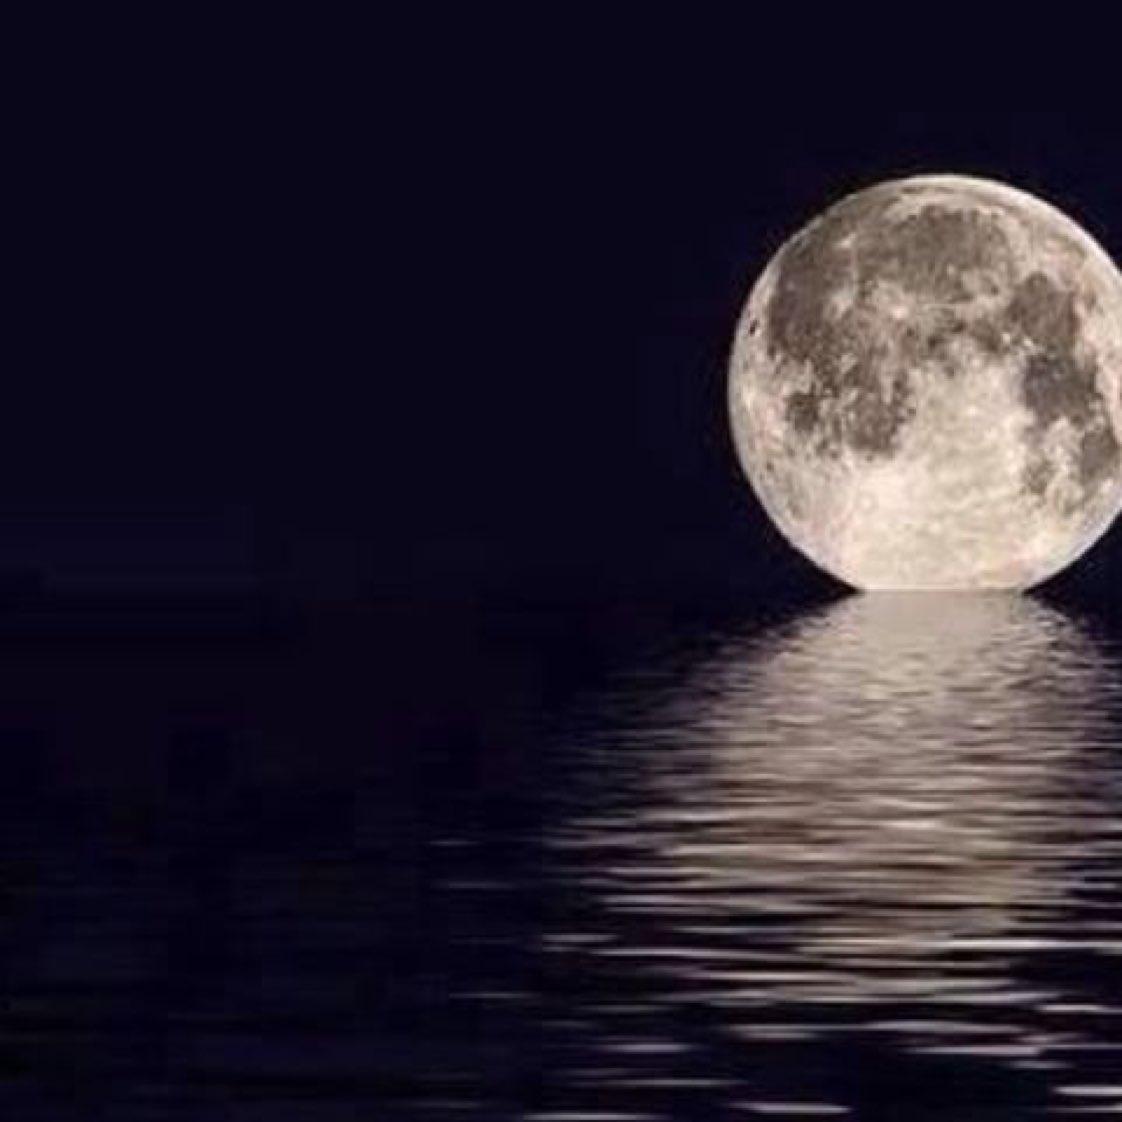 الليل ساكن  والقمر نوره  يبعثرني بعثره و...